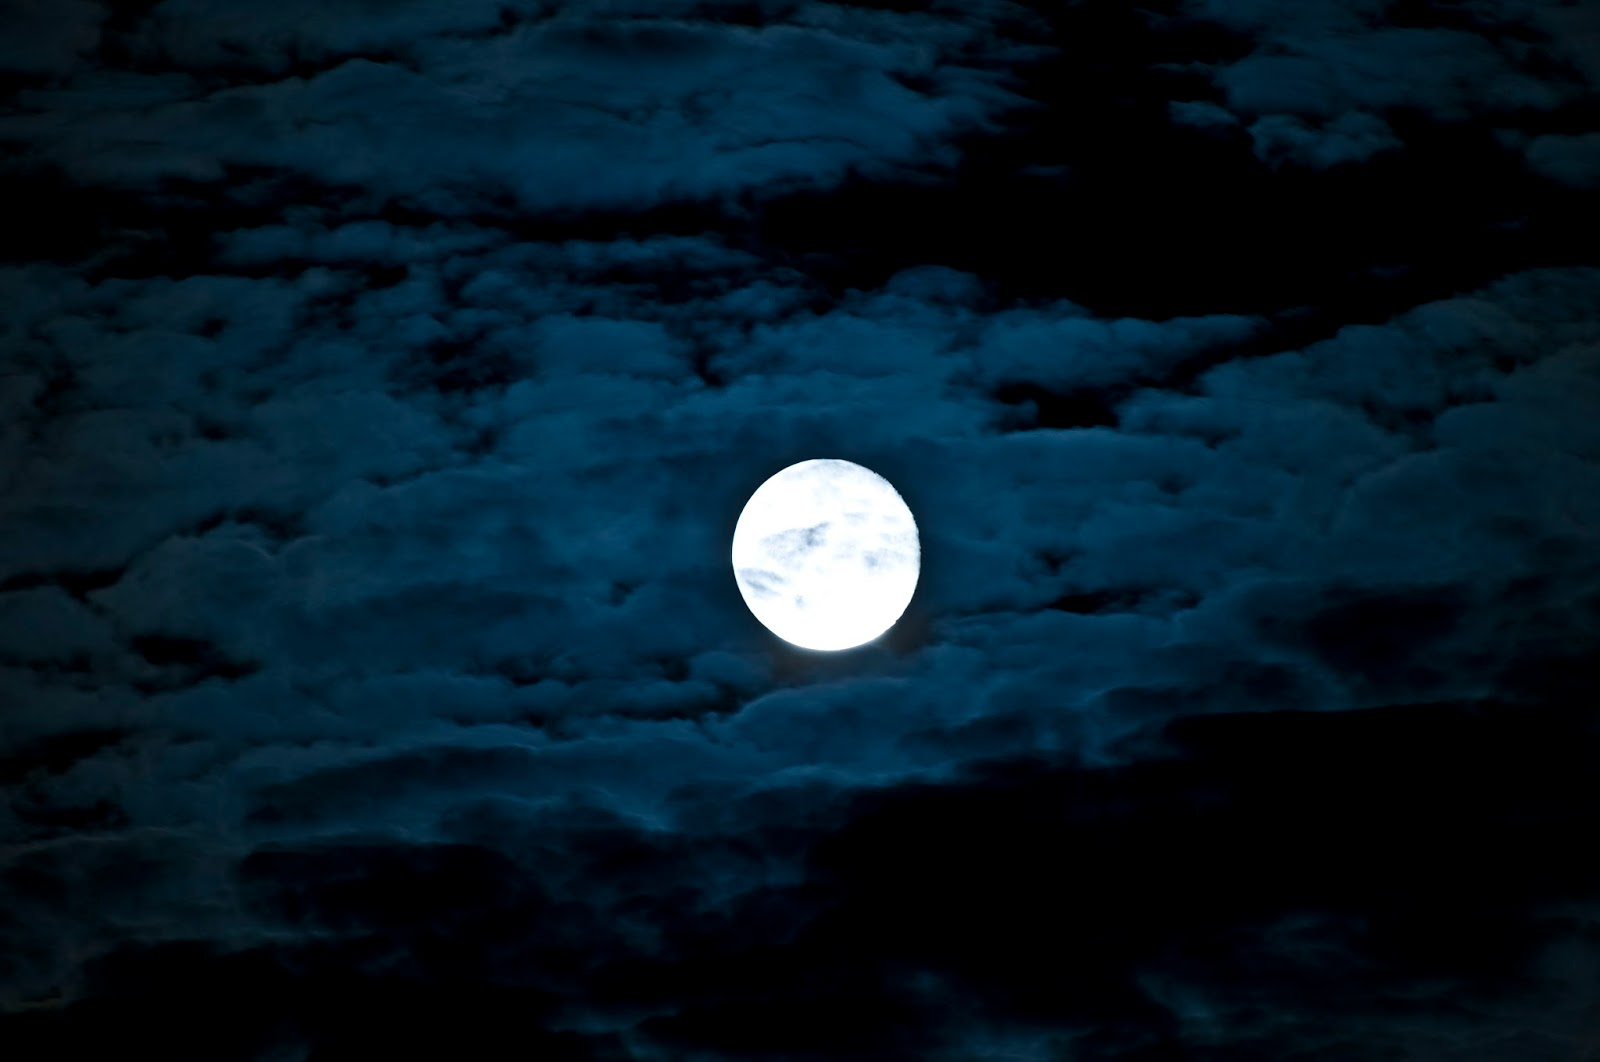 Beautiful Wallpapers: Moon Hd Wallpaper